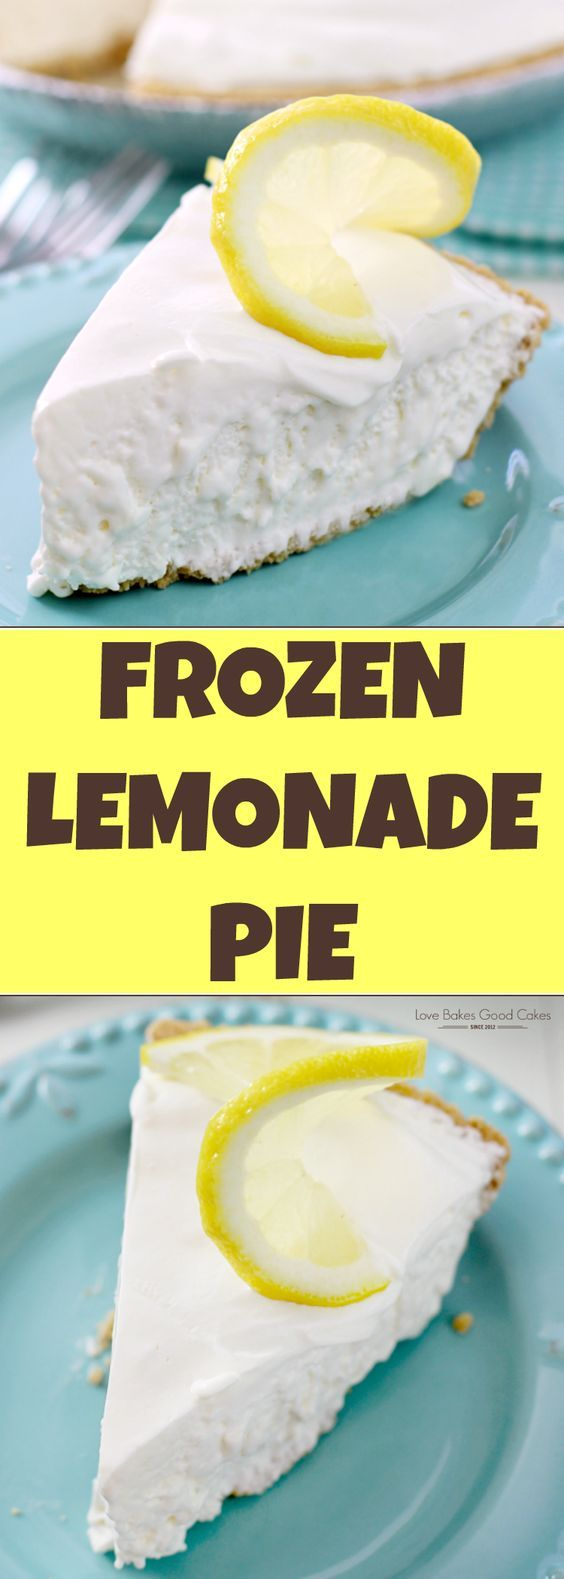 Dessert doesn't get any easier than this Frozen Lemonade Pie! It's a lemon lover's dream come true! (Frozen Cake Square)